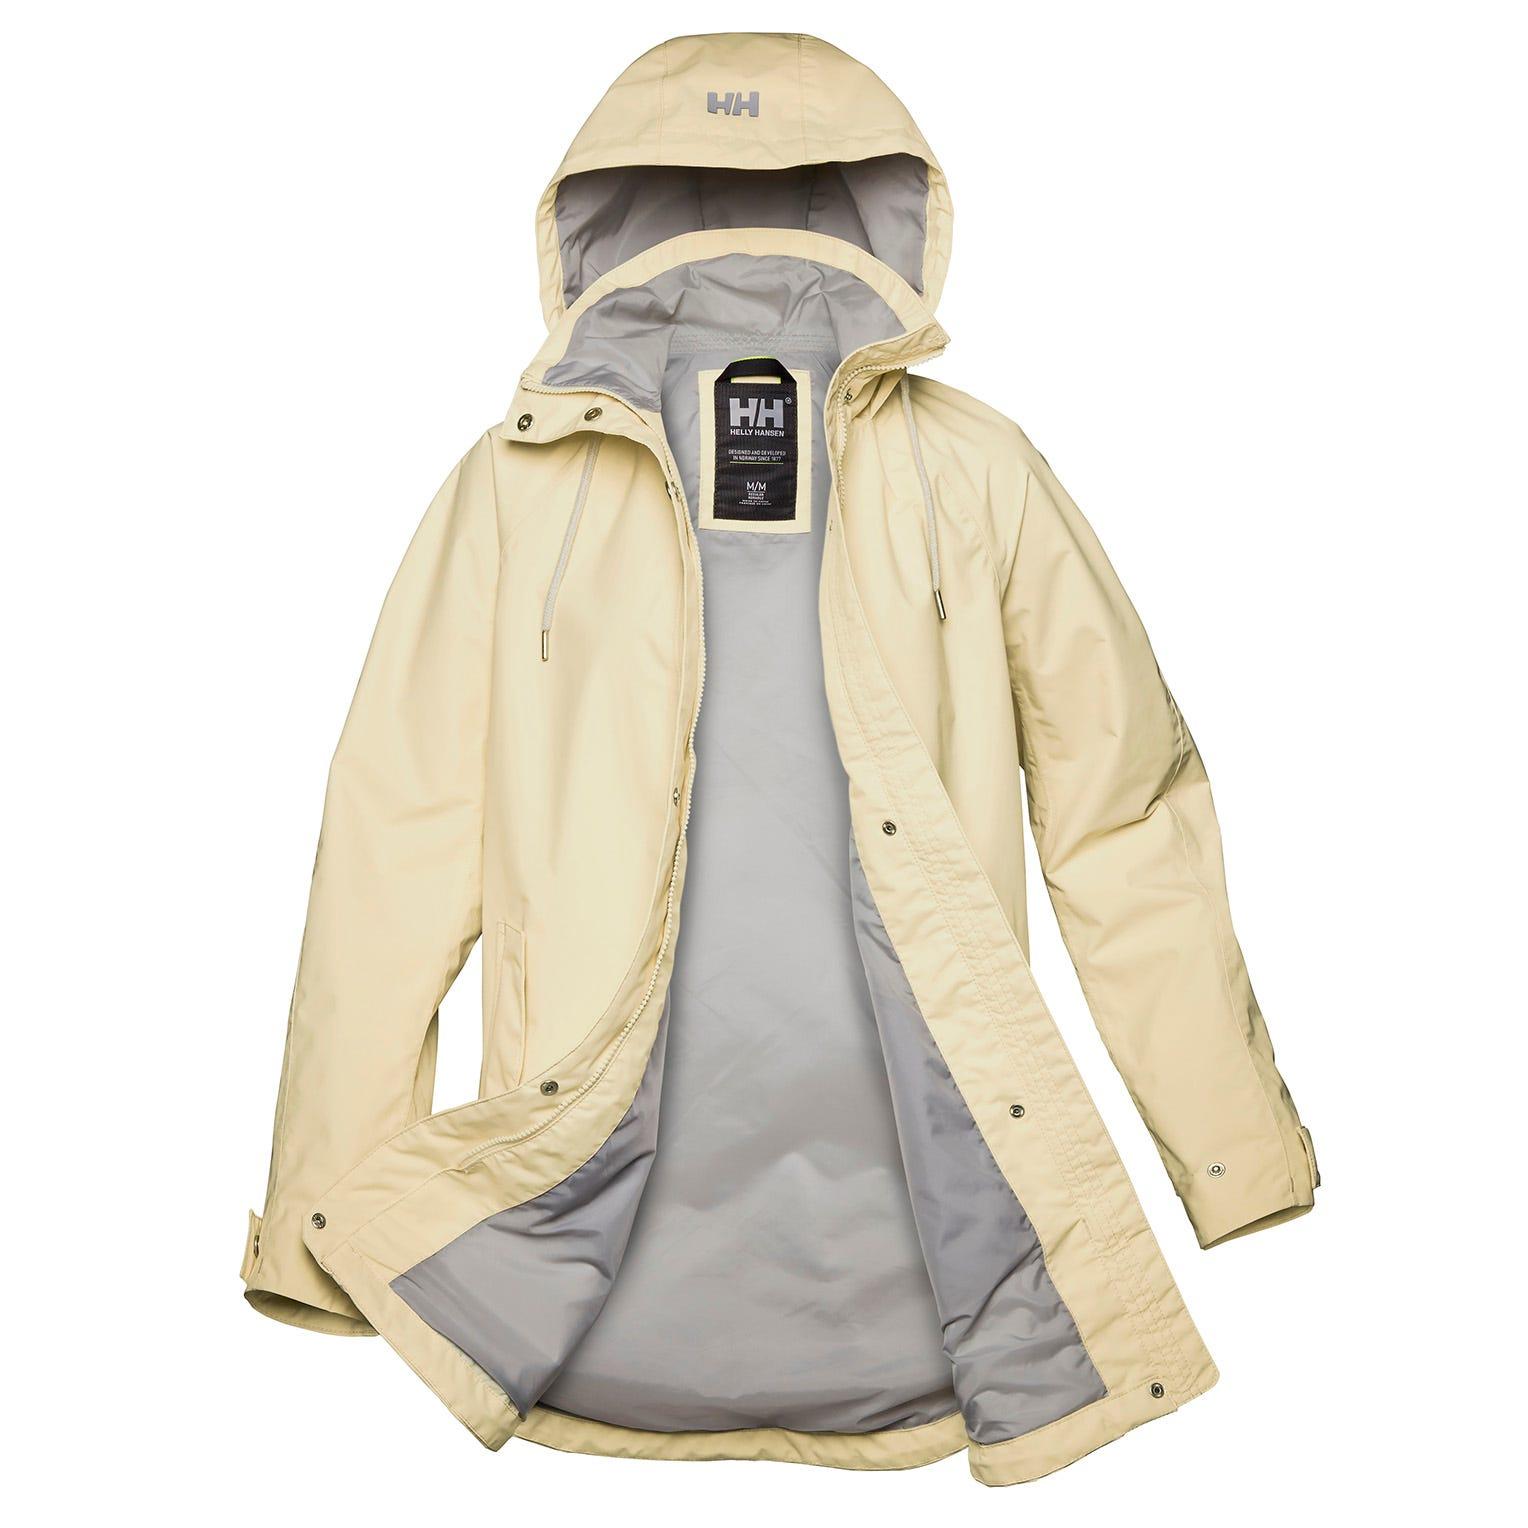 Helly Hansen Womens Valentia Windproof Raincoat White L